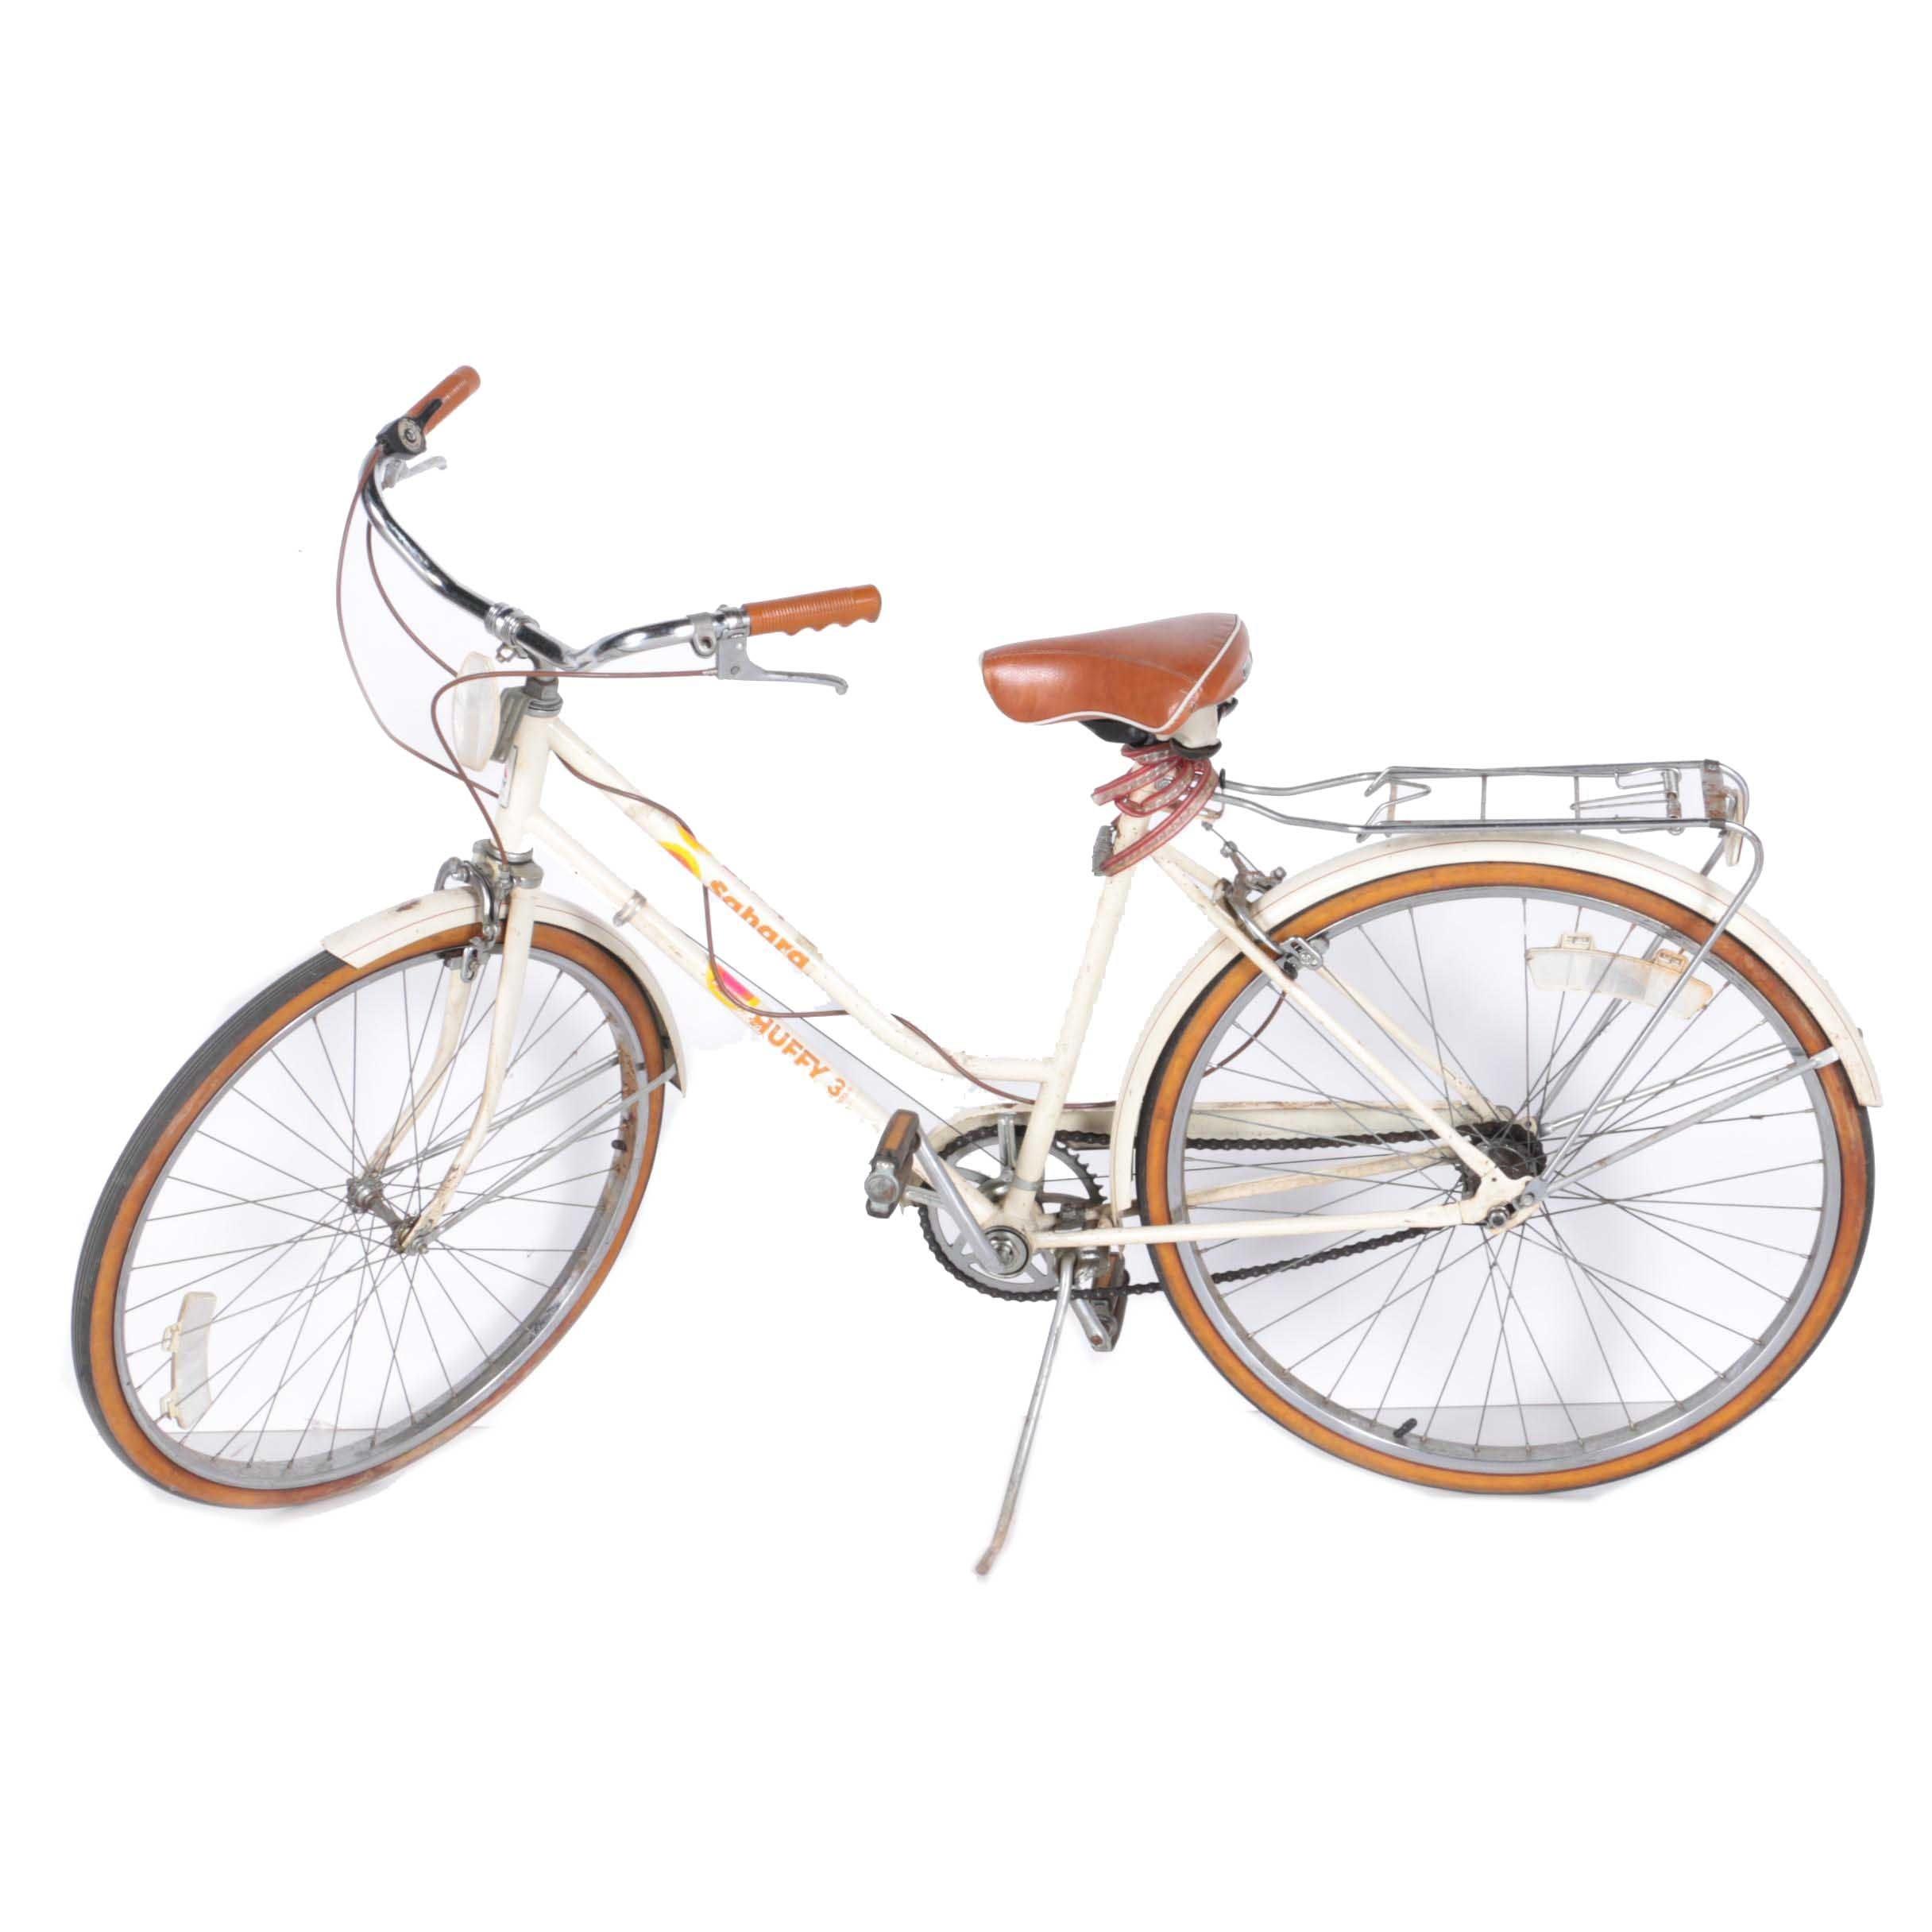 Huffy Sahara 3 speed Women's Bicycle